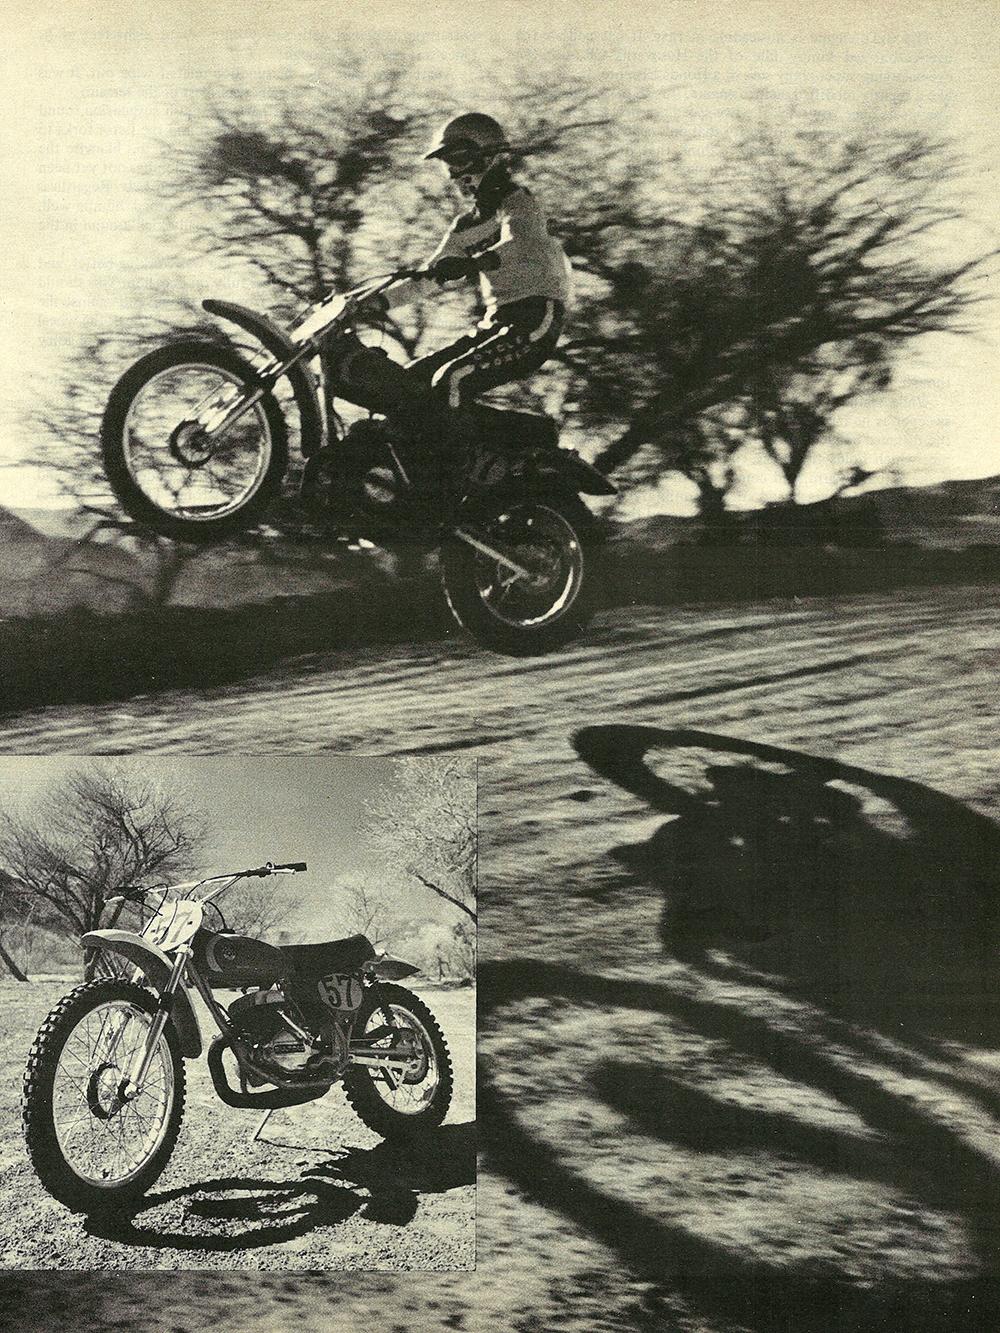 1974 Bultaco 352 Pomeroy road test 04.jpg